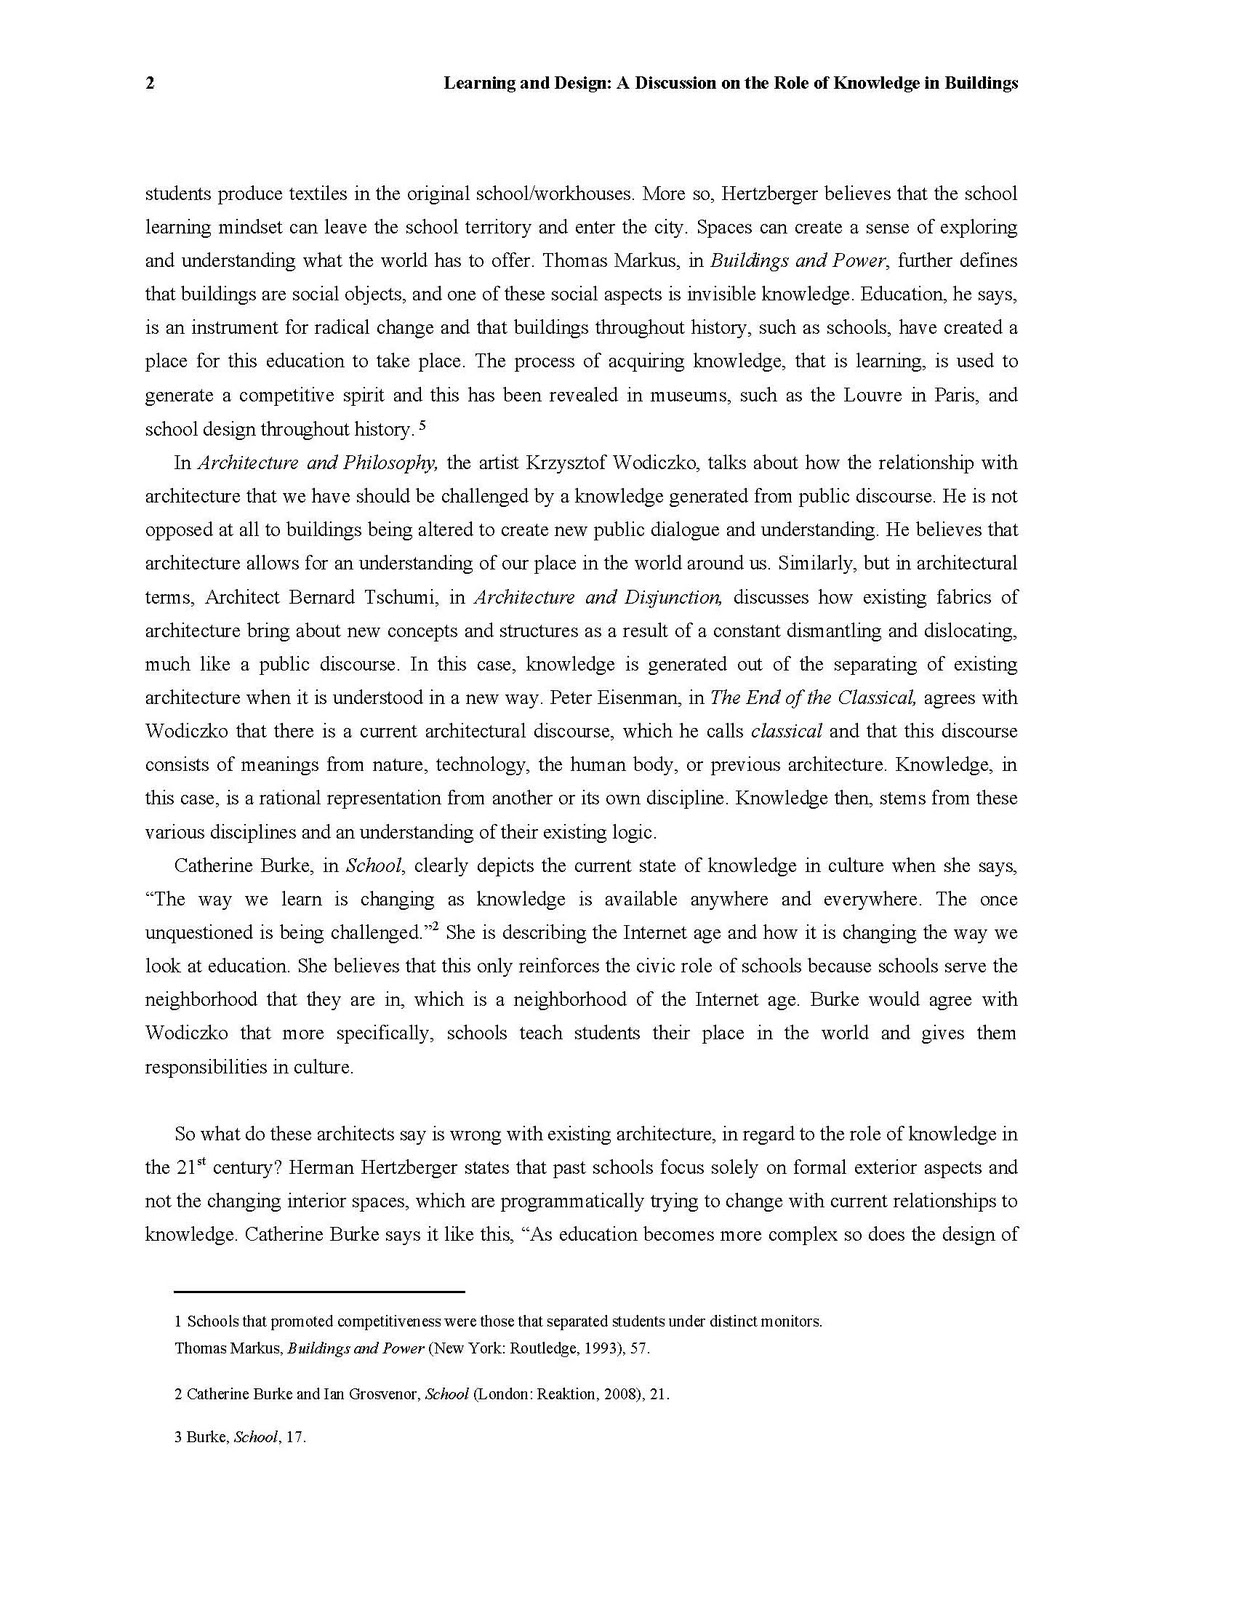 015 Bibliogahhic20essay Page 2 Paragraph Essay Sample Stirring 5 Free Outline Template Printable Argumentative Full